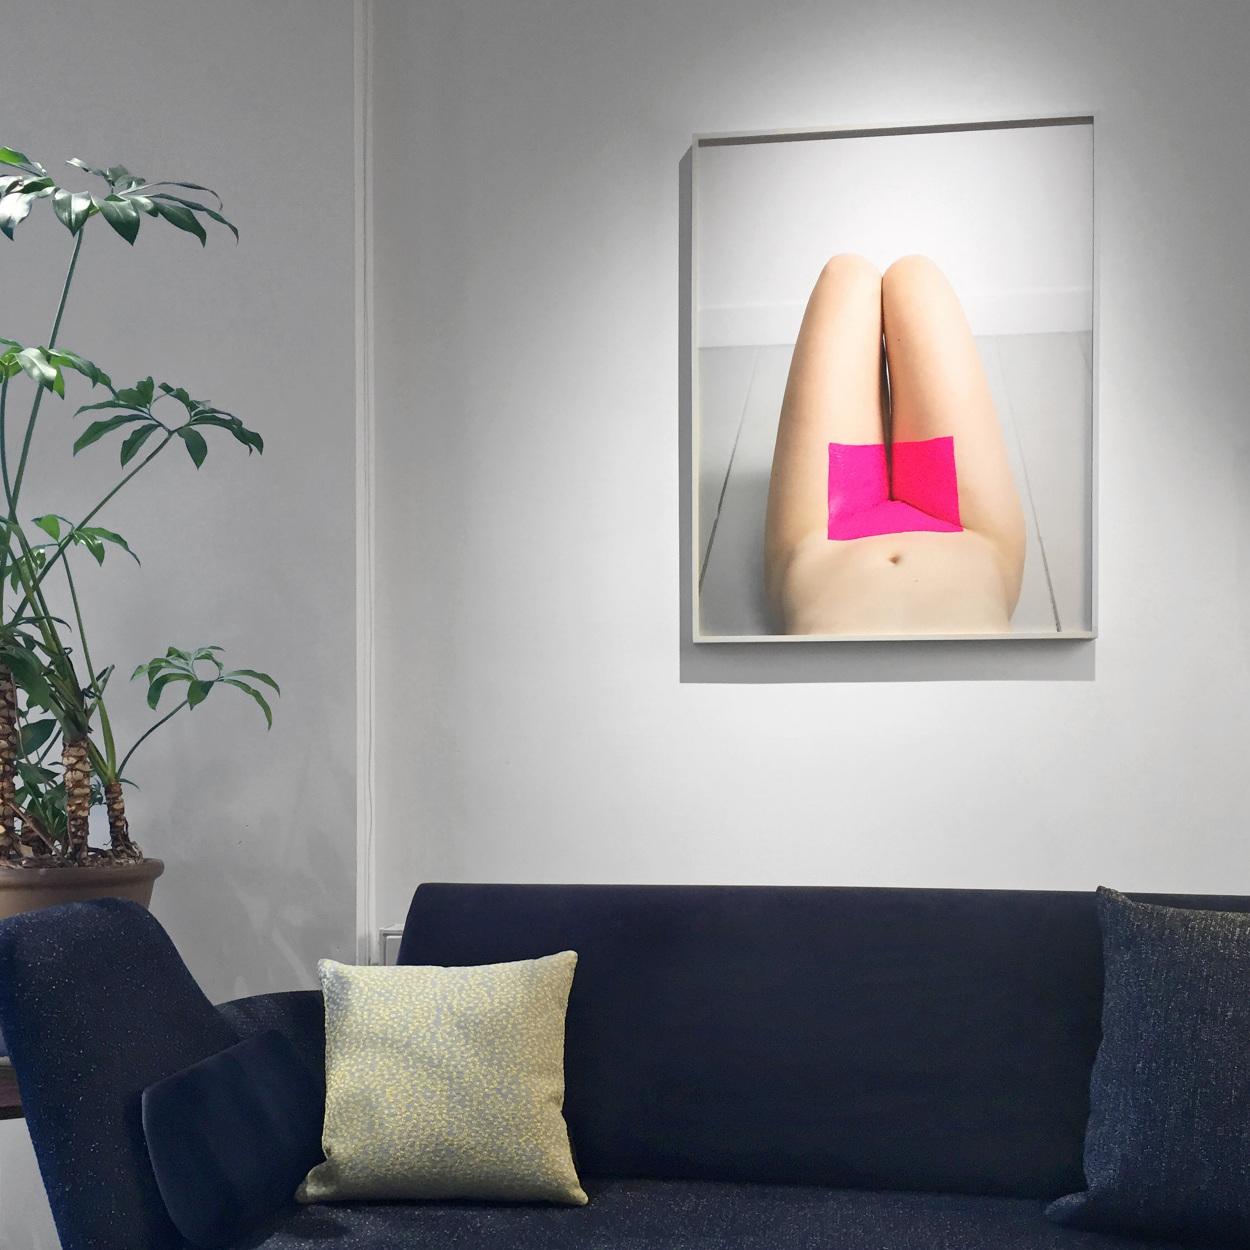 Exhibition monique goossens for Mobilia woonstudio amsterdam